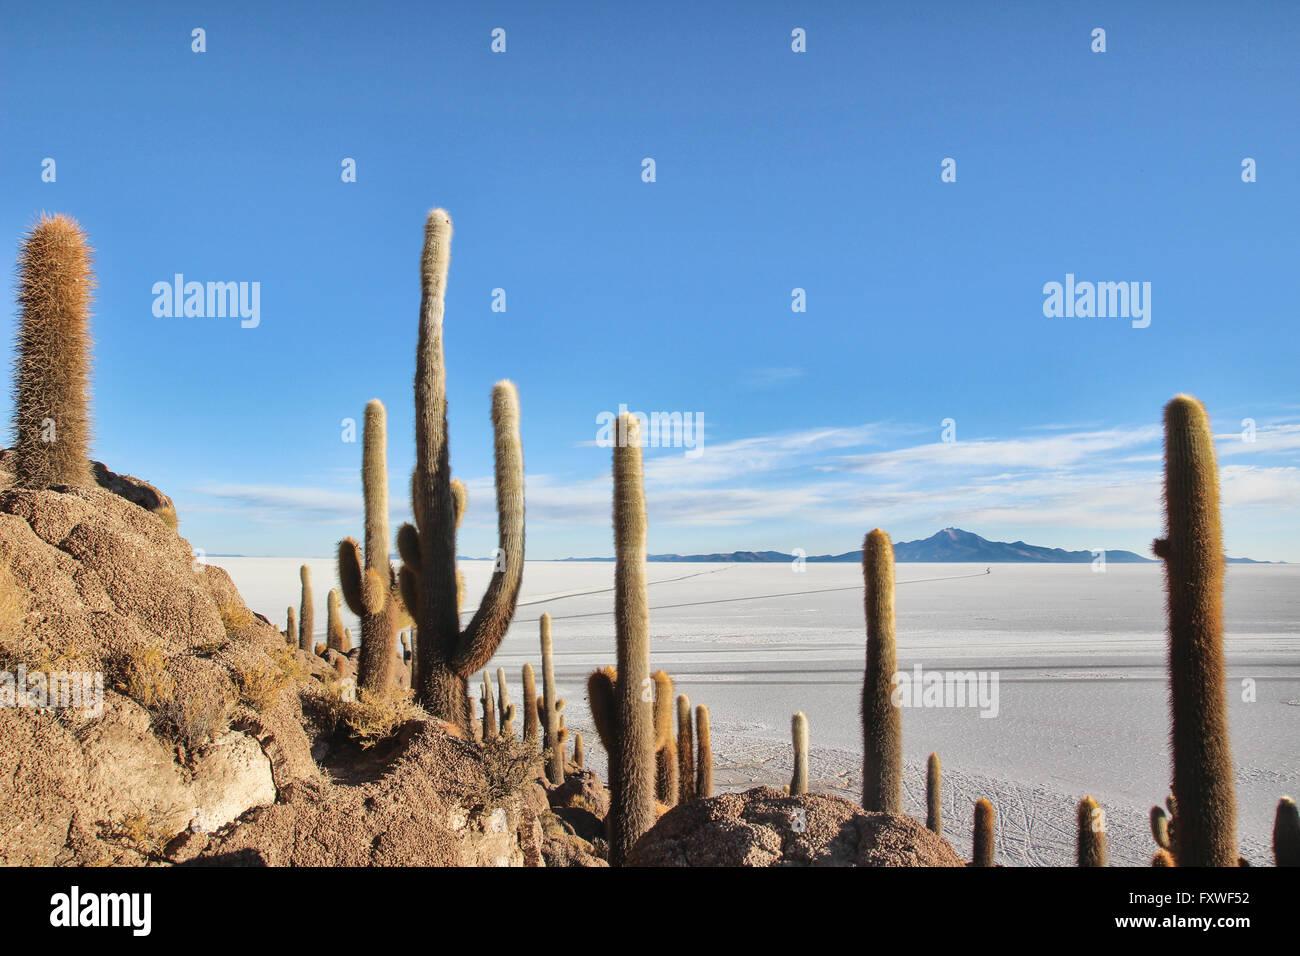 Bolivie - 22/08/2013 - Bolivie / Salar de Uyuni / Uyuni Uyuni, désert de sel - Isla del Pescado - Sandrine Photo Stock